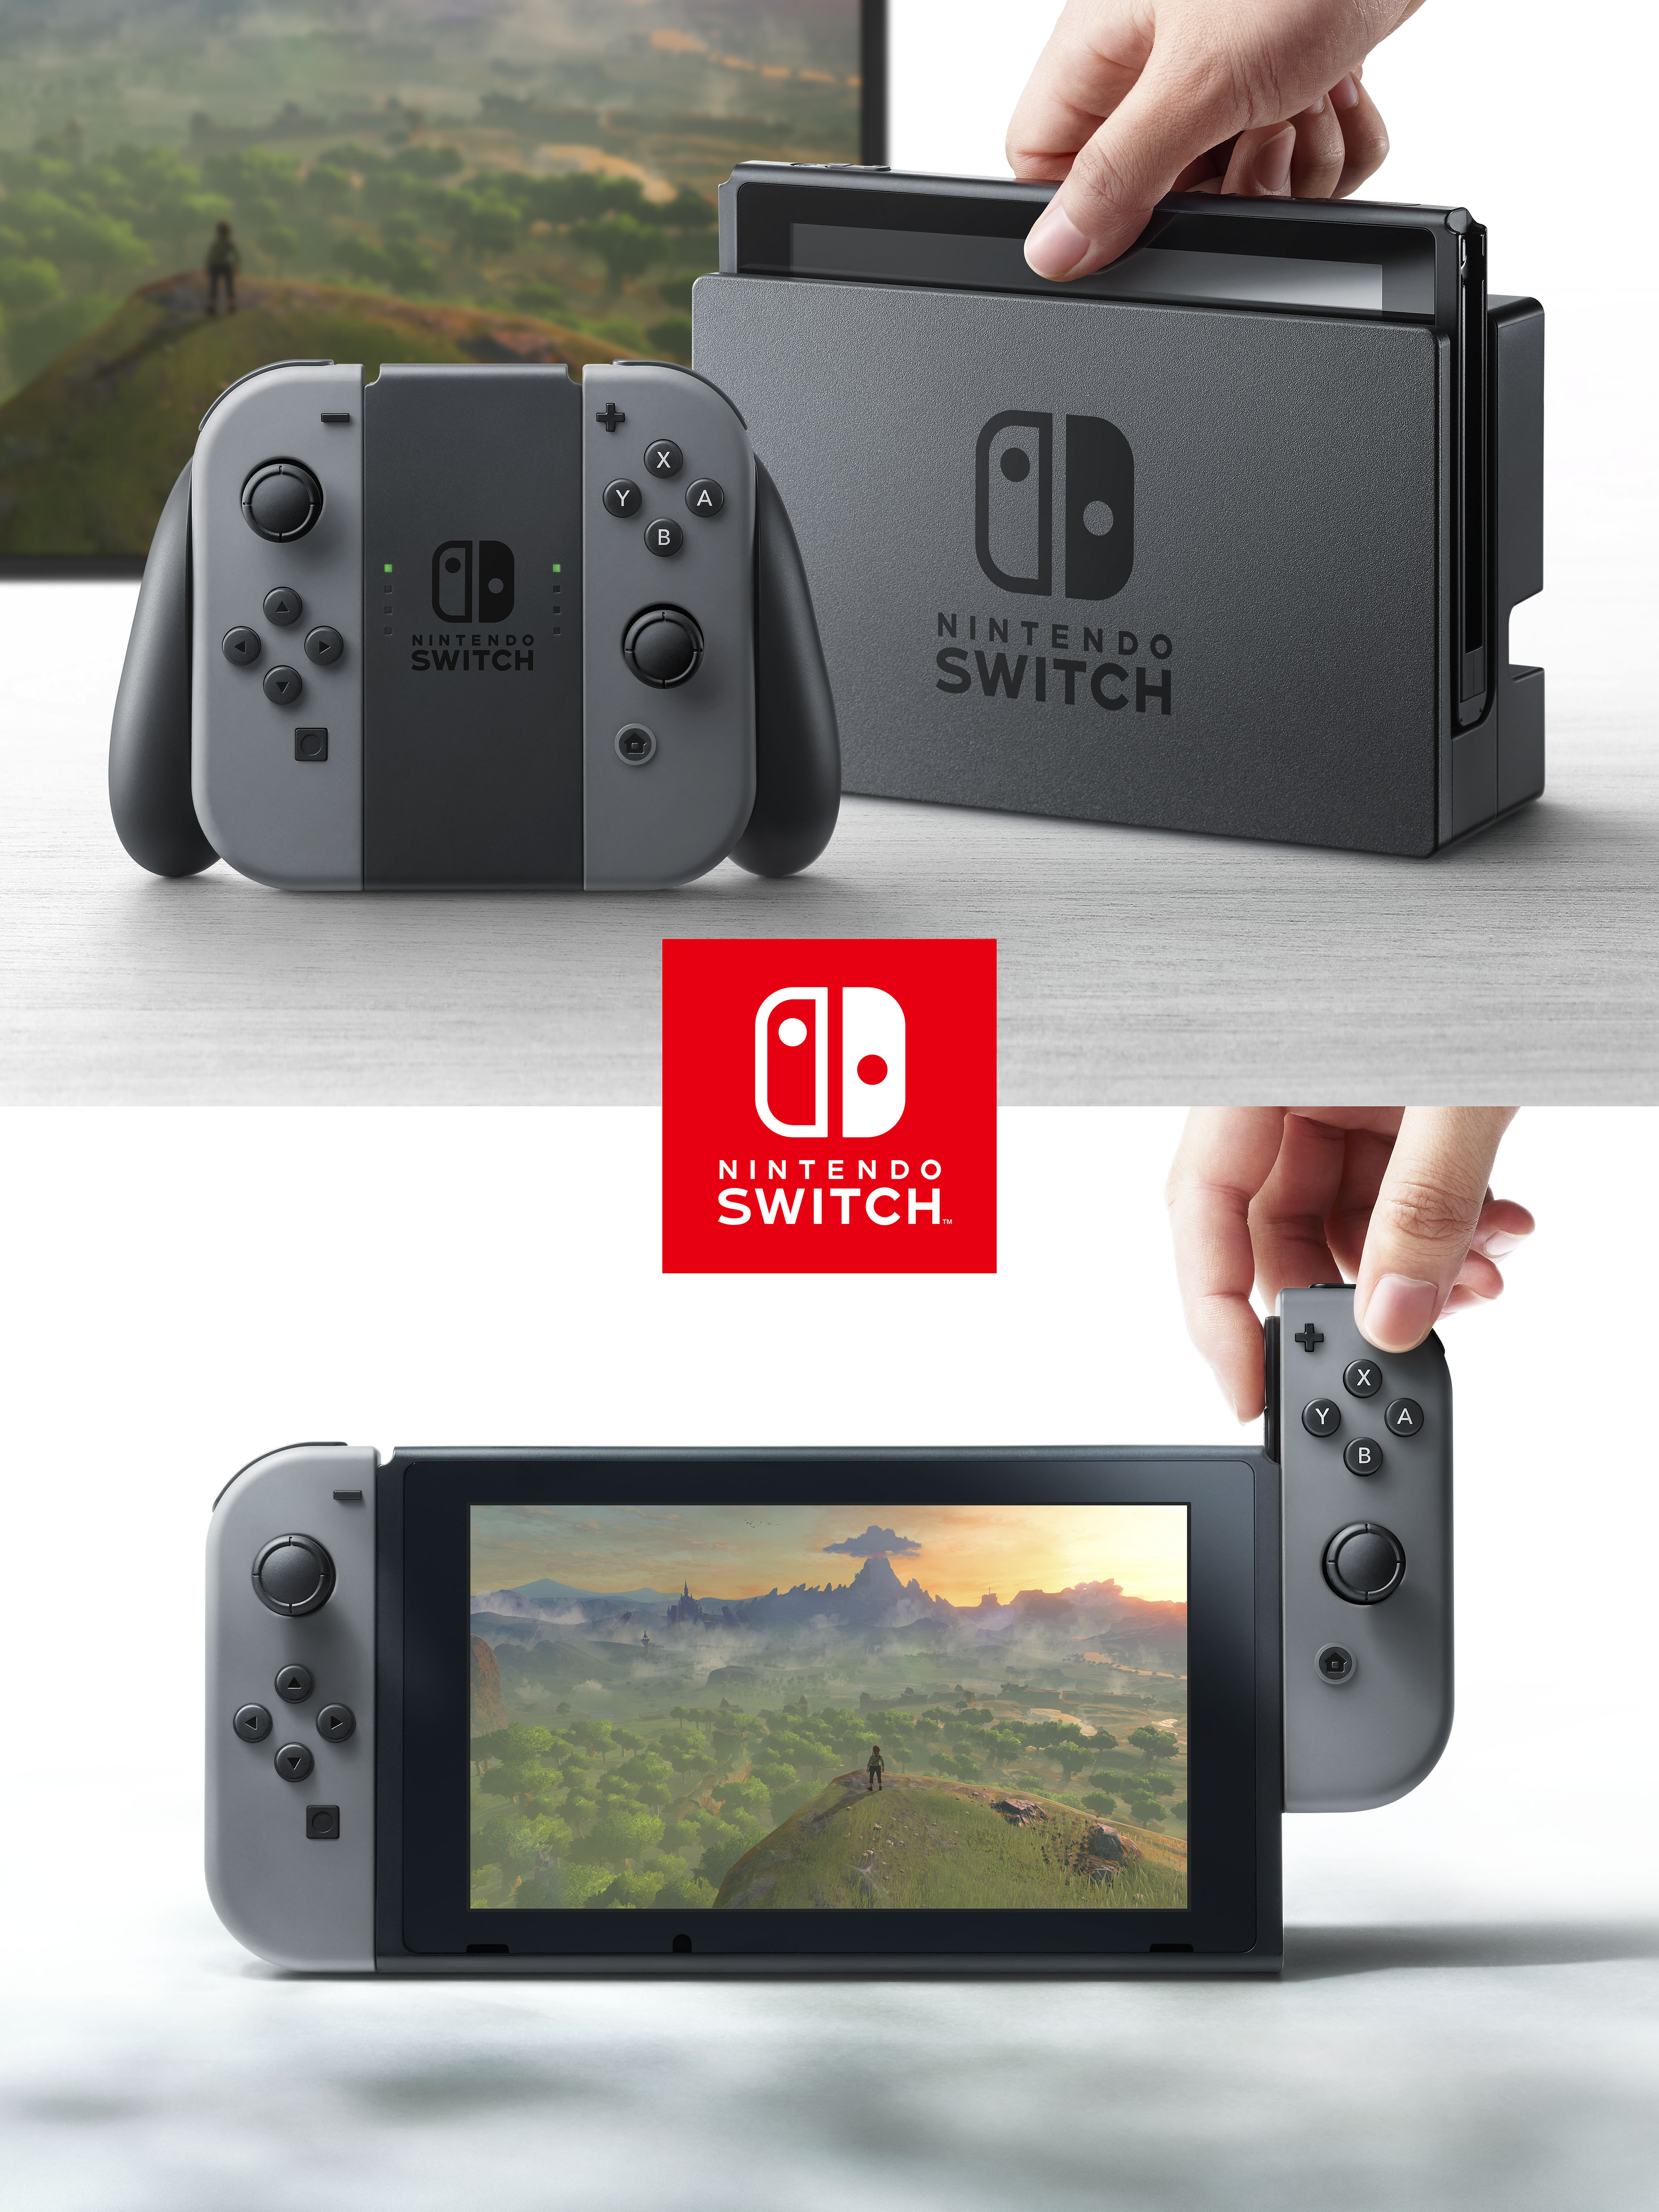 [Bild: NintendoSwitch_hardware.jpg]